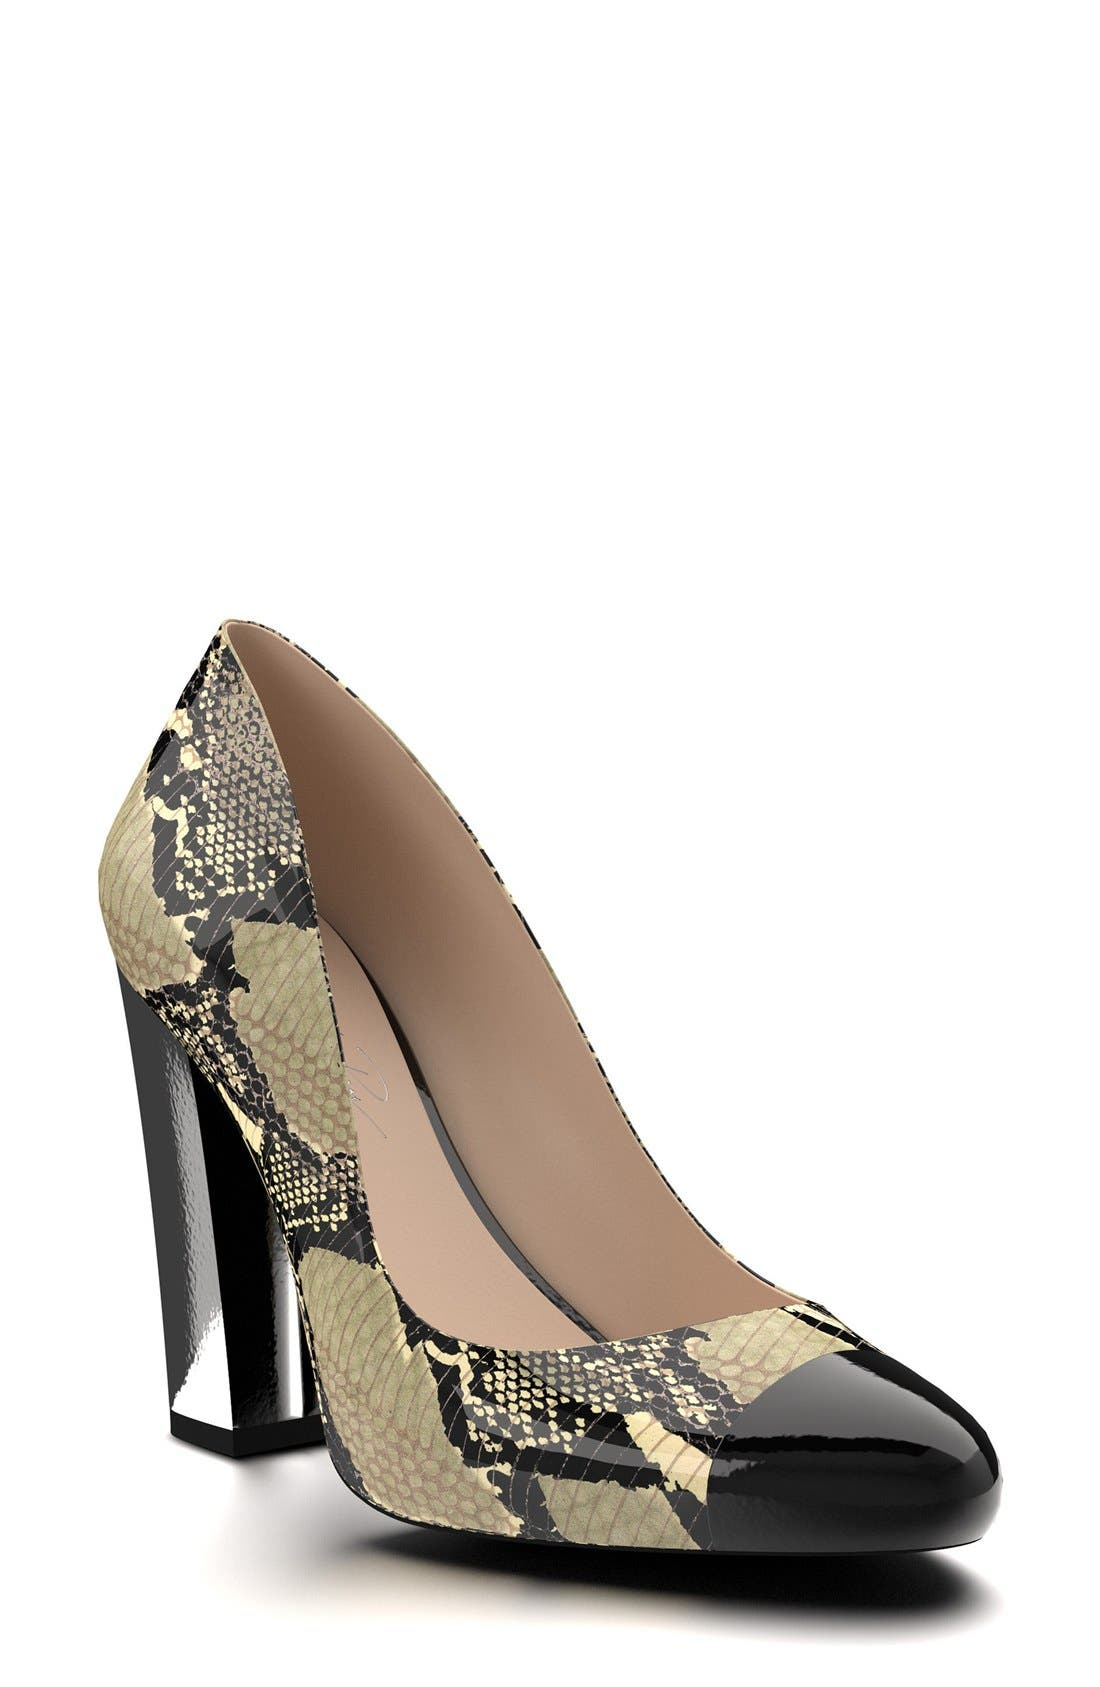 Shoes of Prey Cap Toe Block Heel Pump (Women)